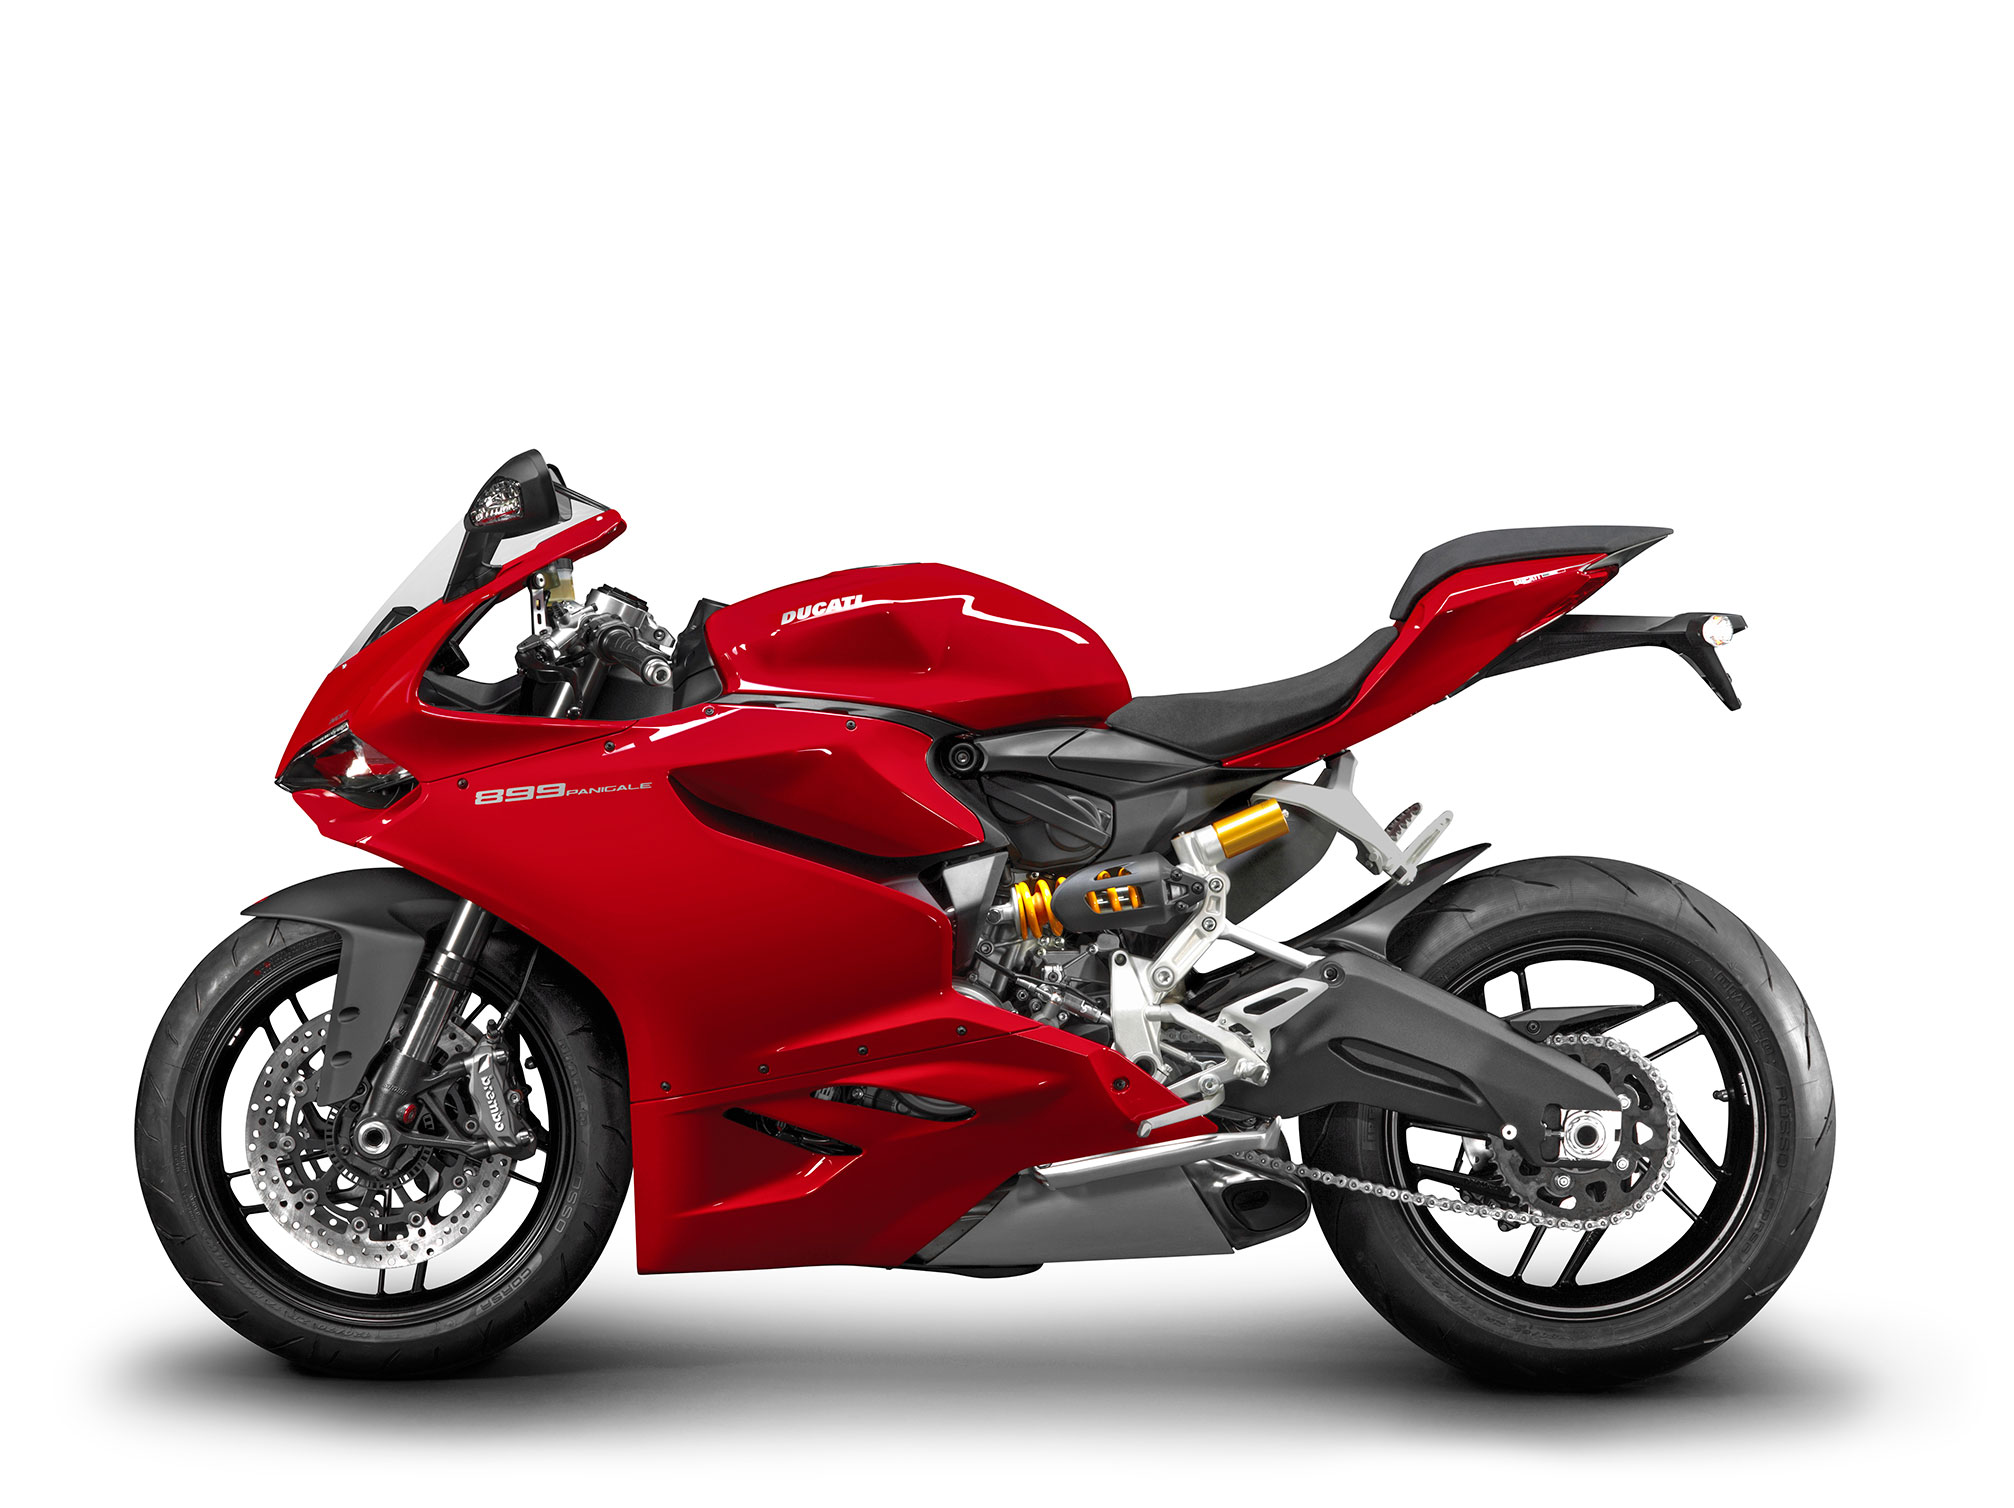 2014 Ducati Superbike 899 Panigale gs wallpaper 2014x1508 150897 2014x1508